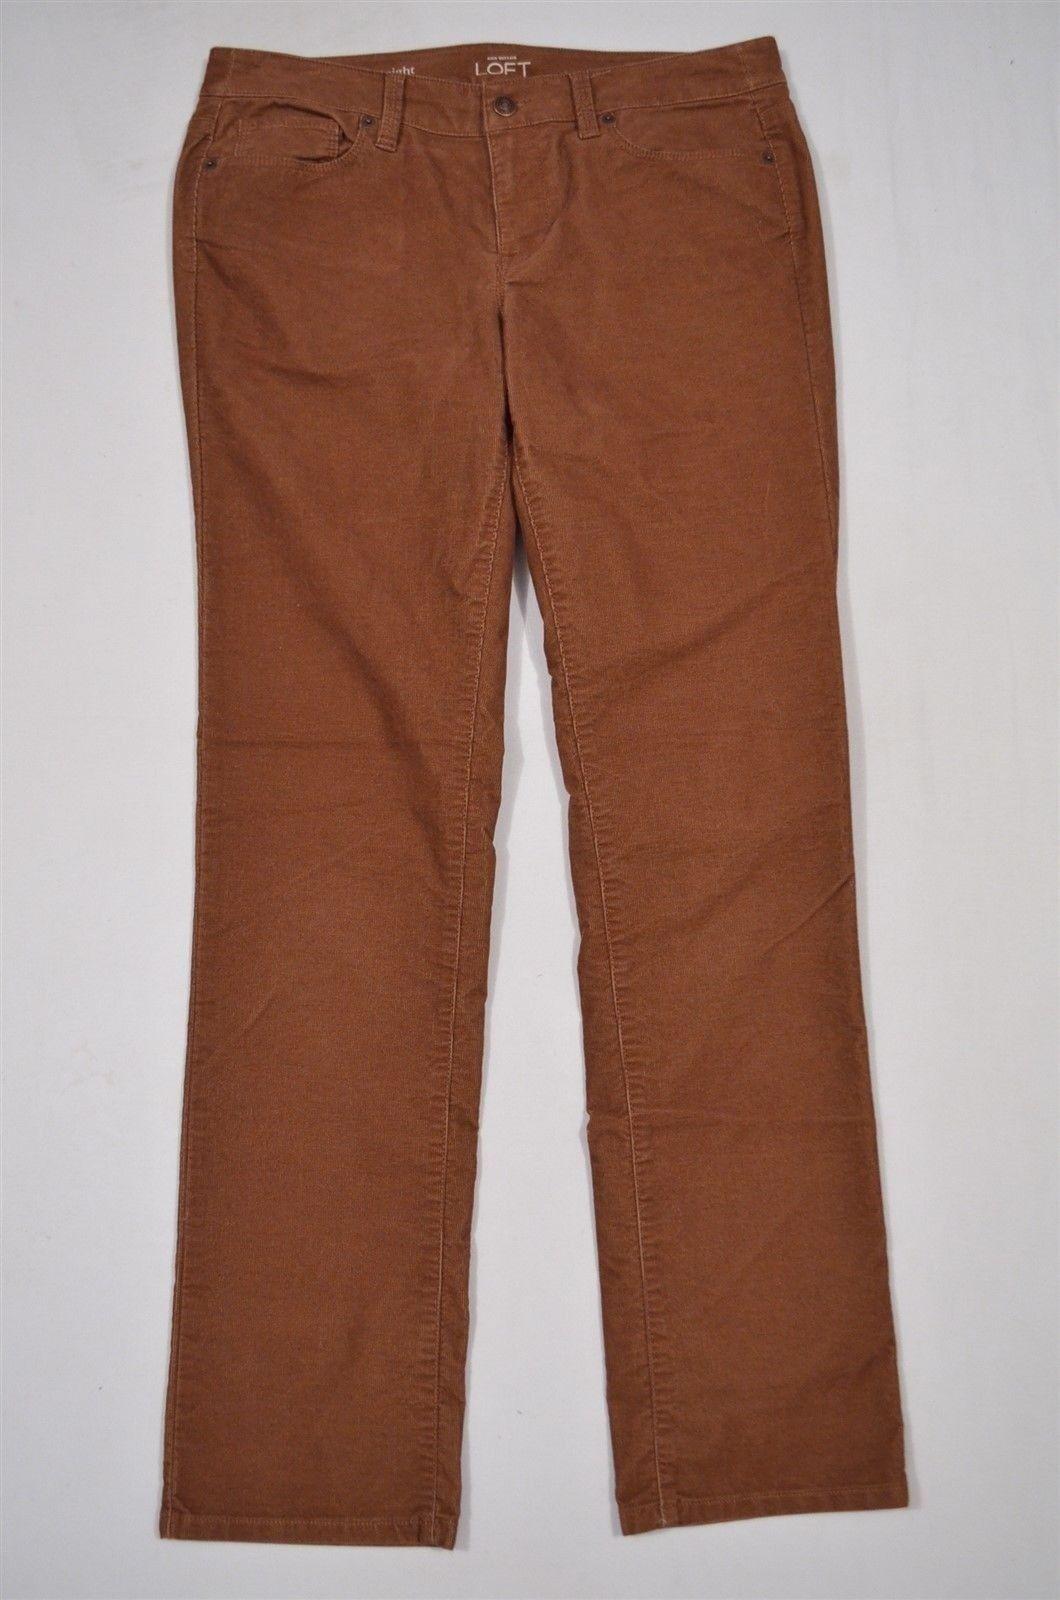 Ann Taylor LOFT Brown Corduroy Modern Straight Size 28 6